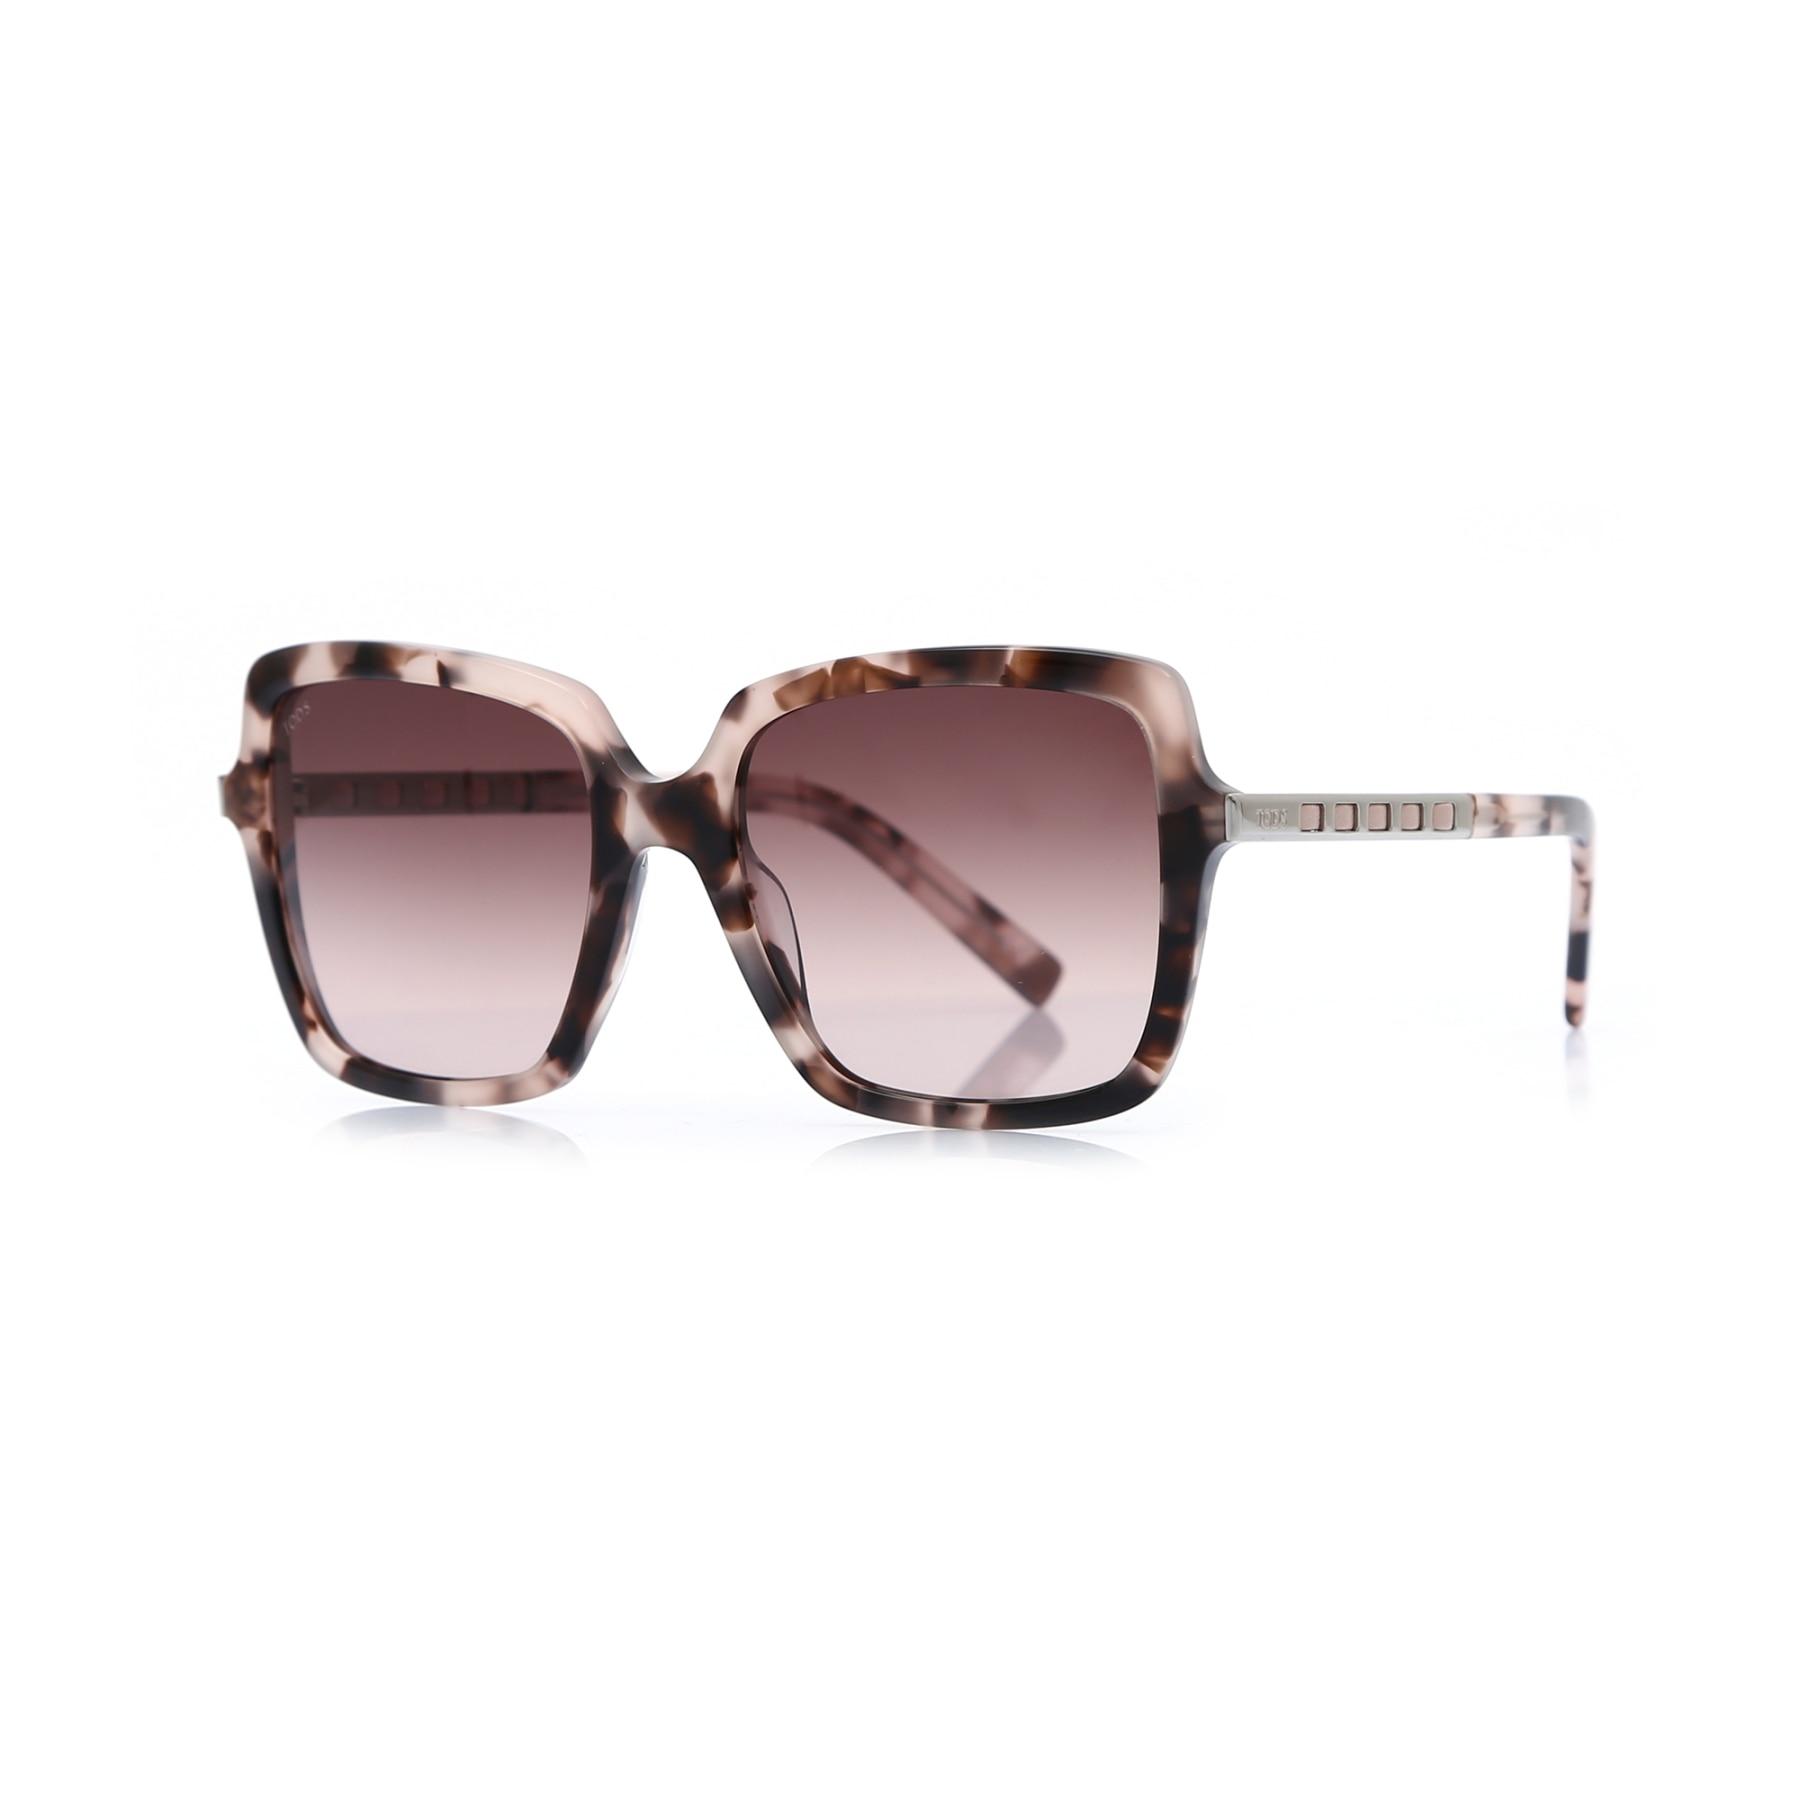 Women's sunglasses to 0250 55t Bone Brown organic square square 56-19-140 tods